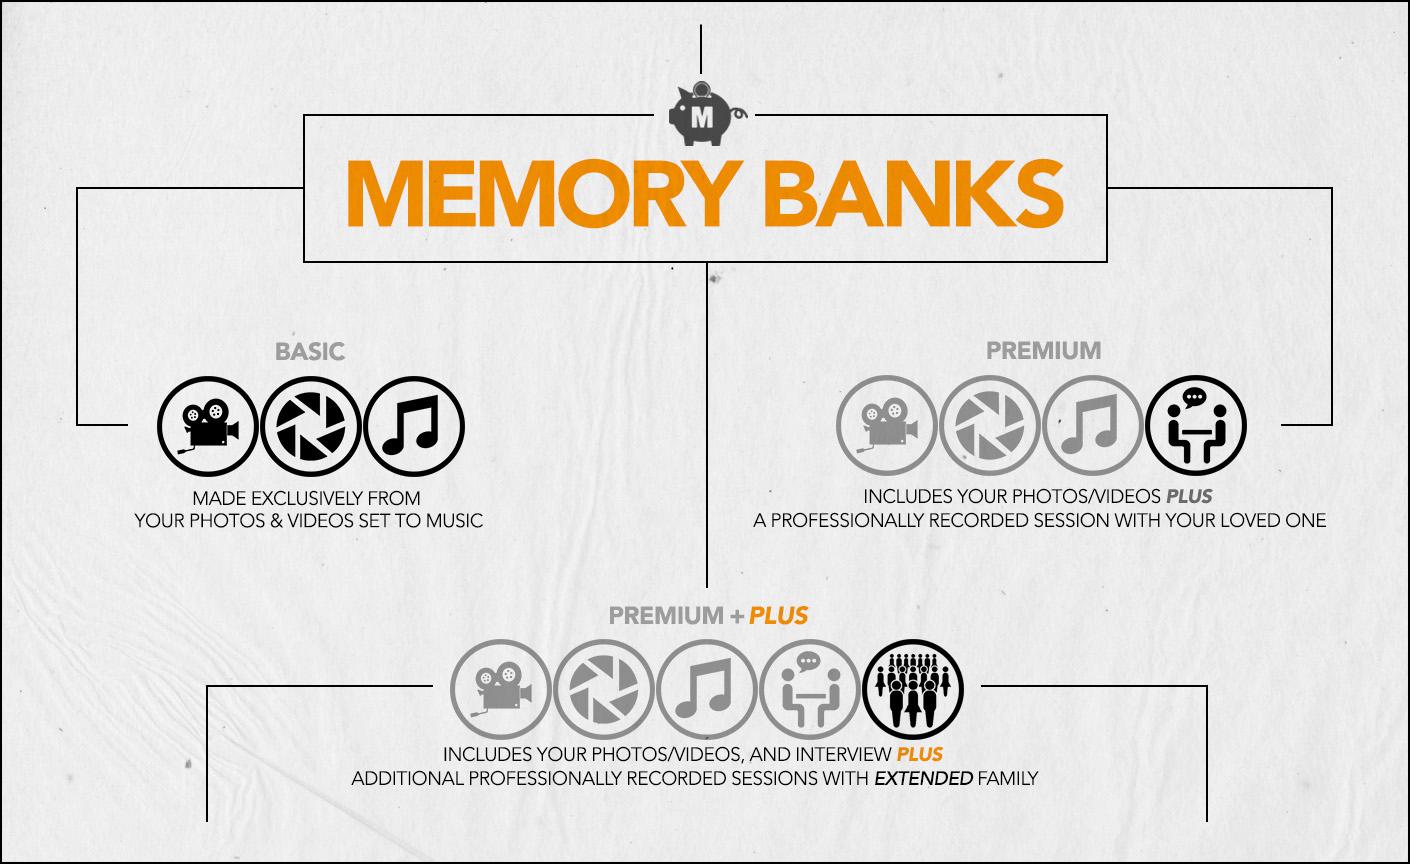 MemoryBank.jpg